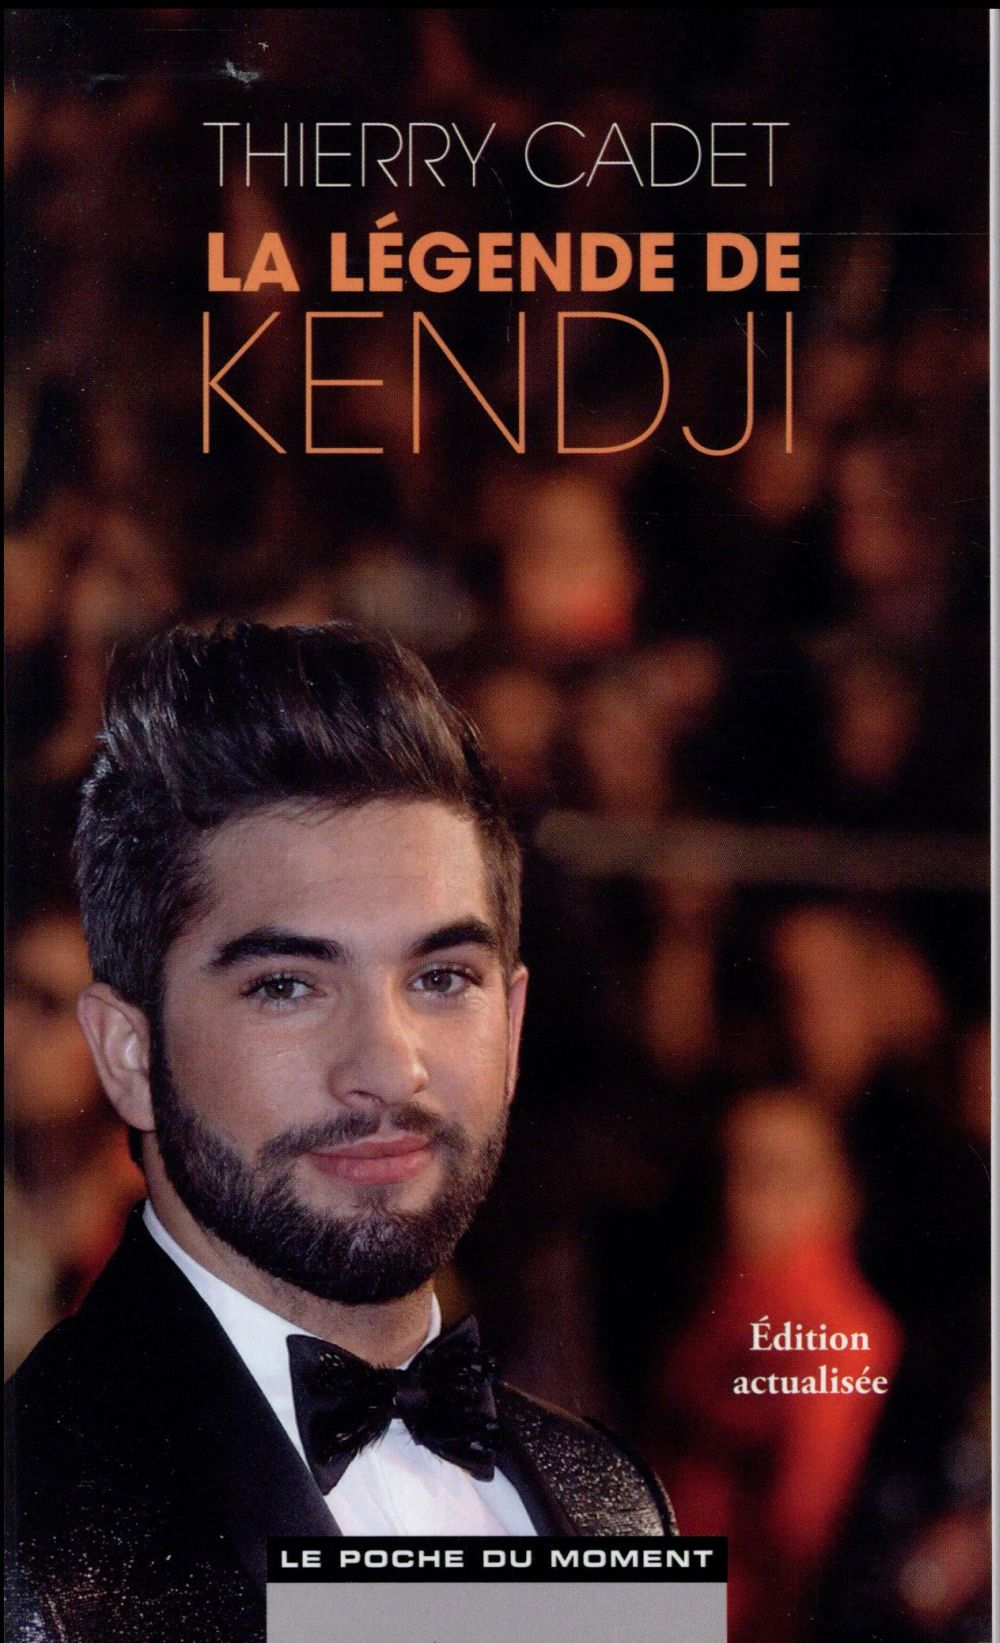 La légende de Kendji